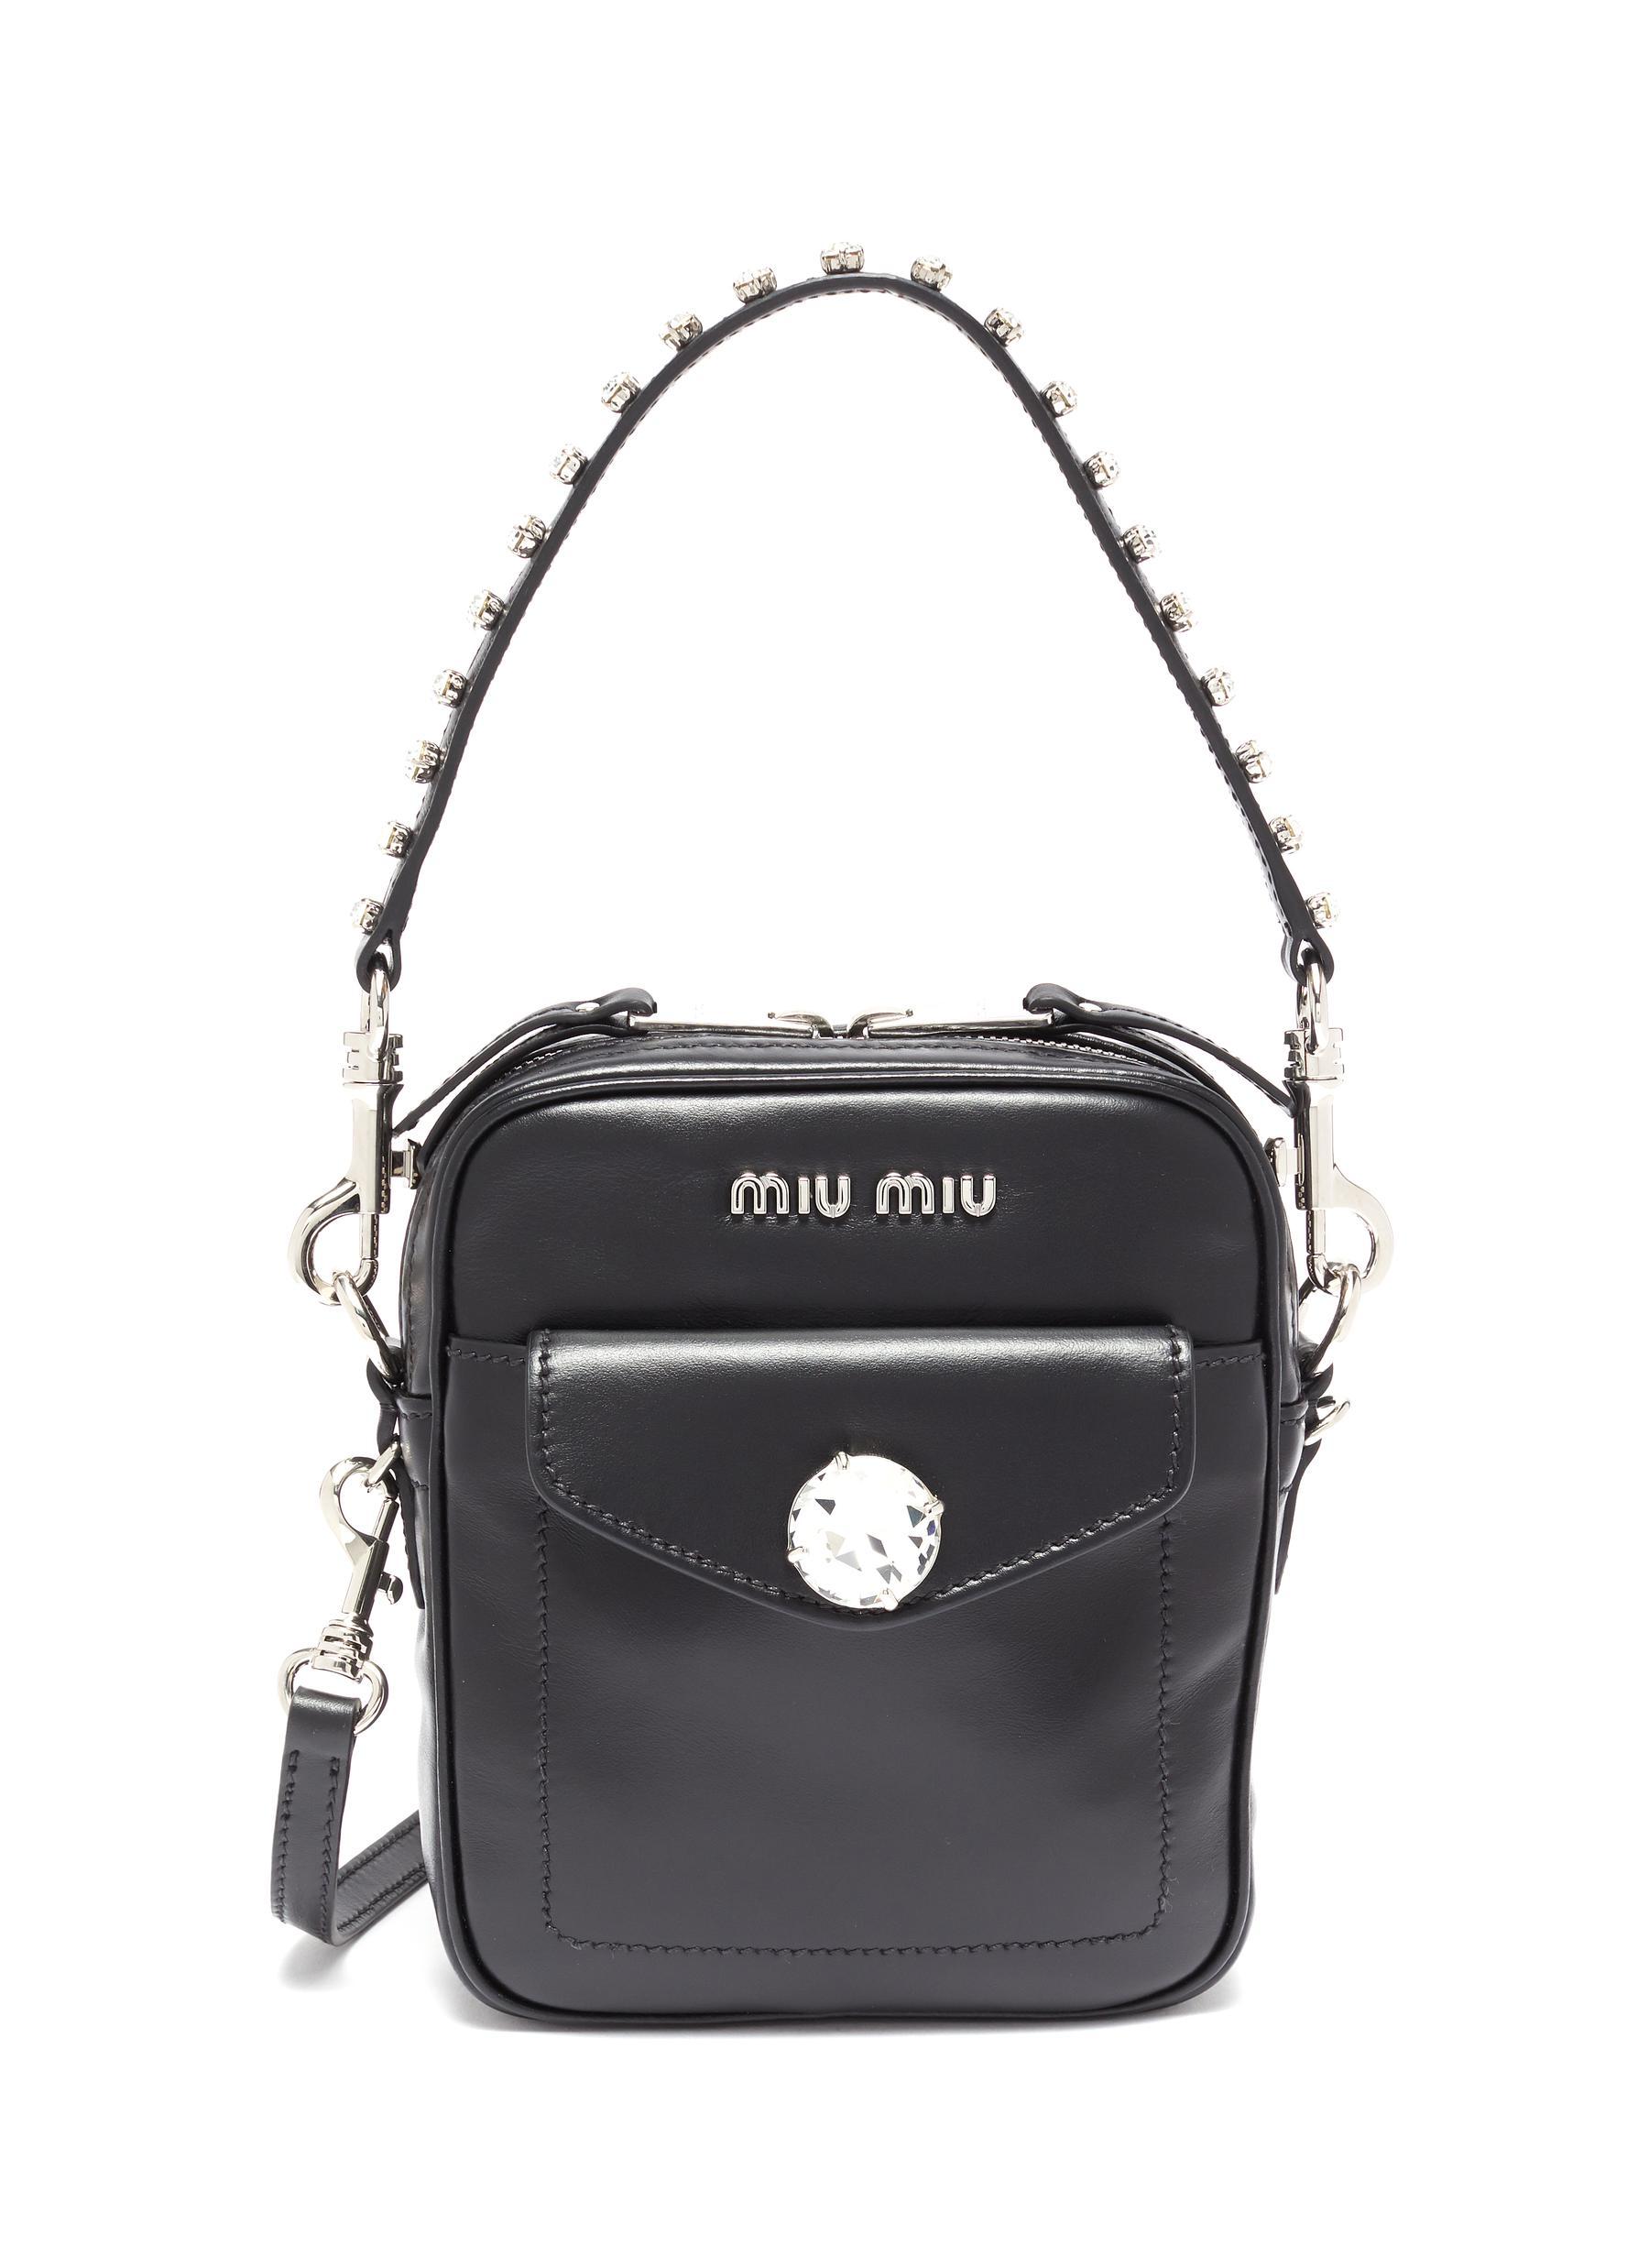 Miu Miu Glass Crystal Leather Crossbody Bag